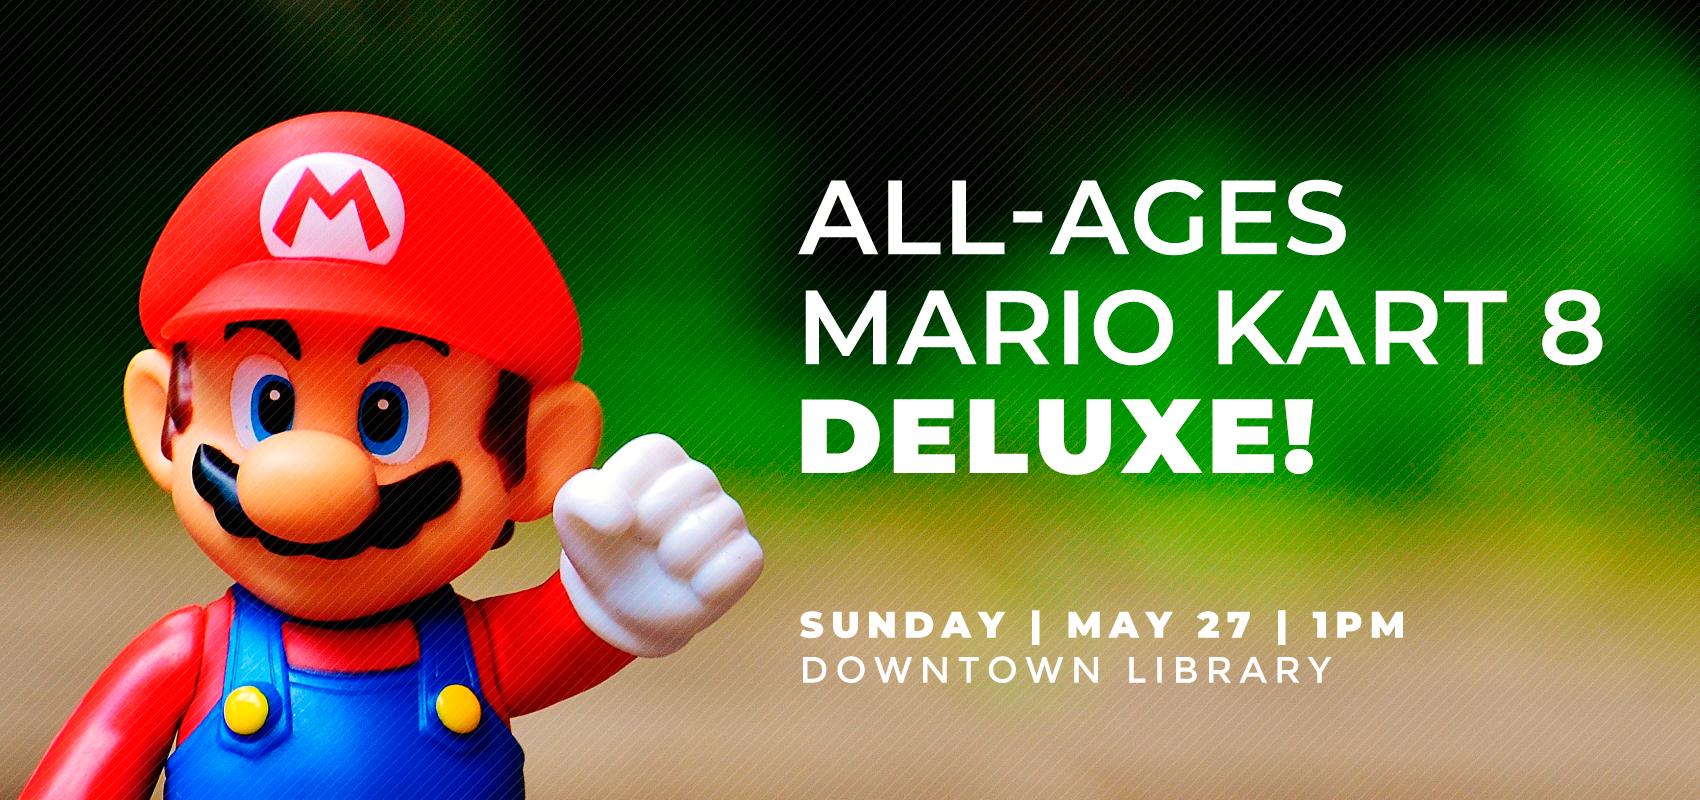 Mario Kart - Sunday May 27. .